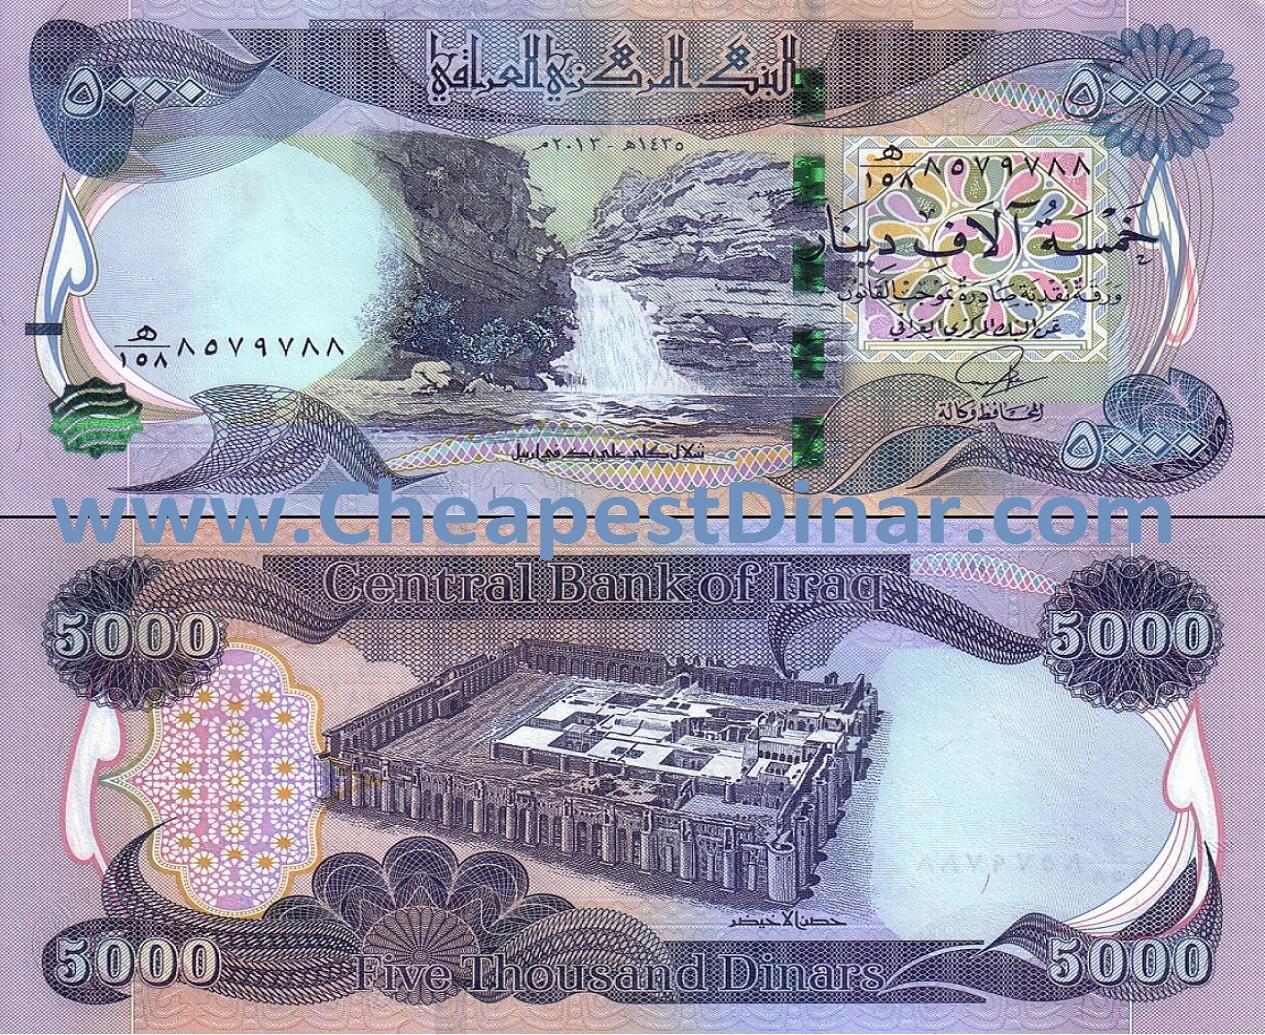 Iraqi Dinar 30,000 New Crisp Uncirculated 1,000 Banknotes 30 x 1000 Fast Ship!